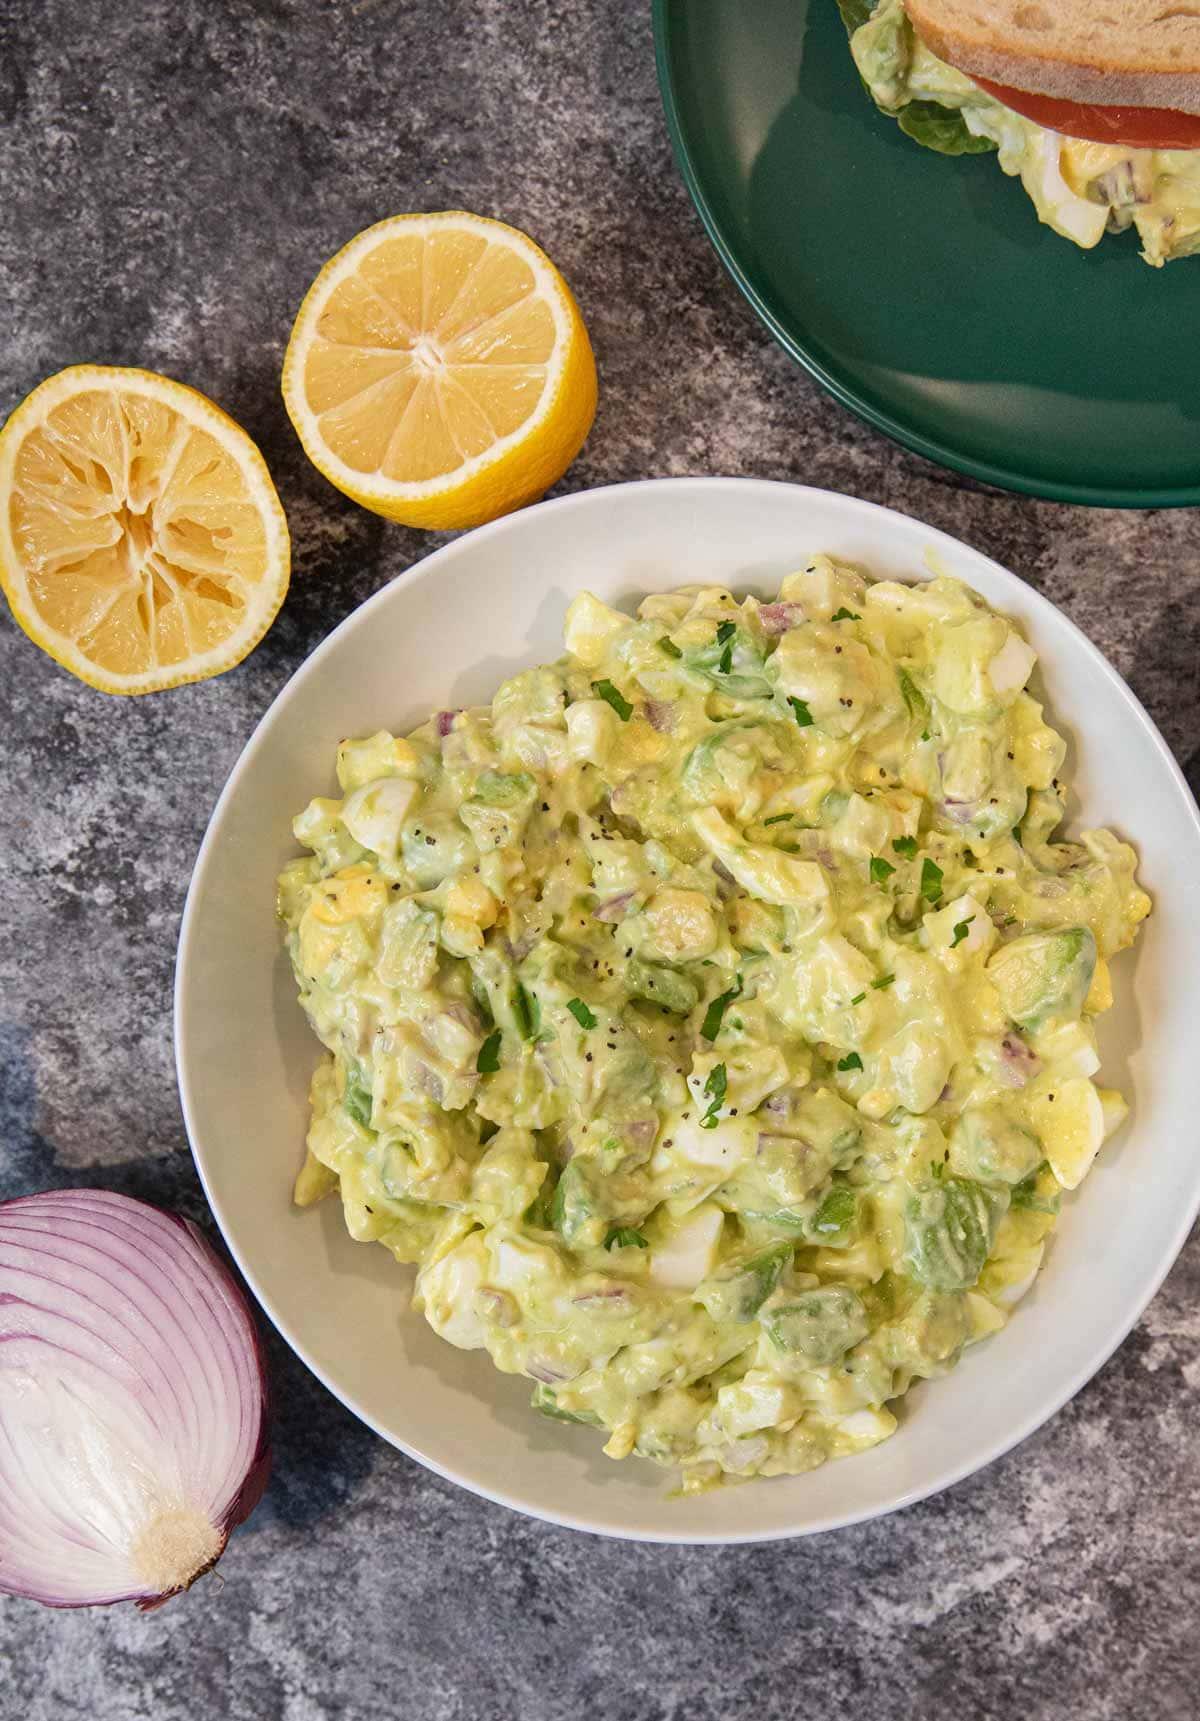 Avocado Egg Salad in serving bowl